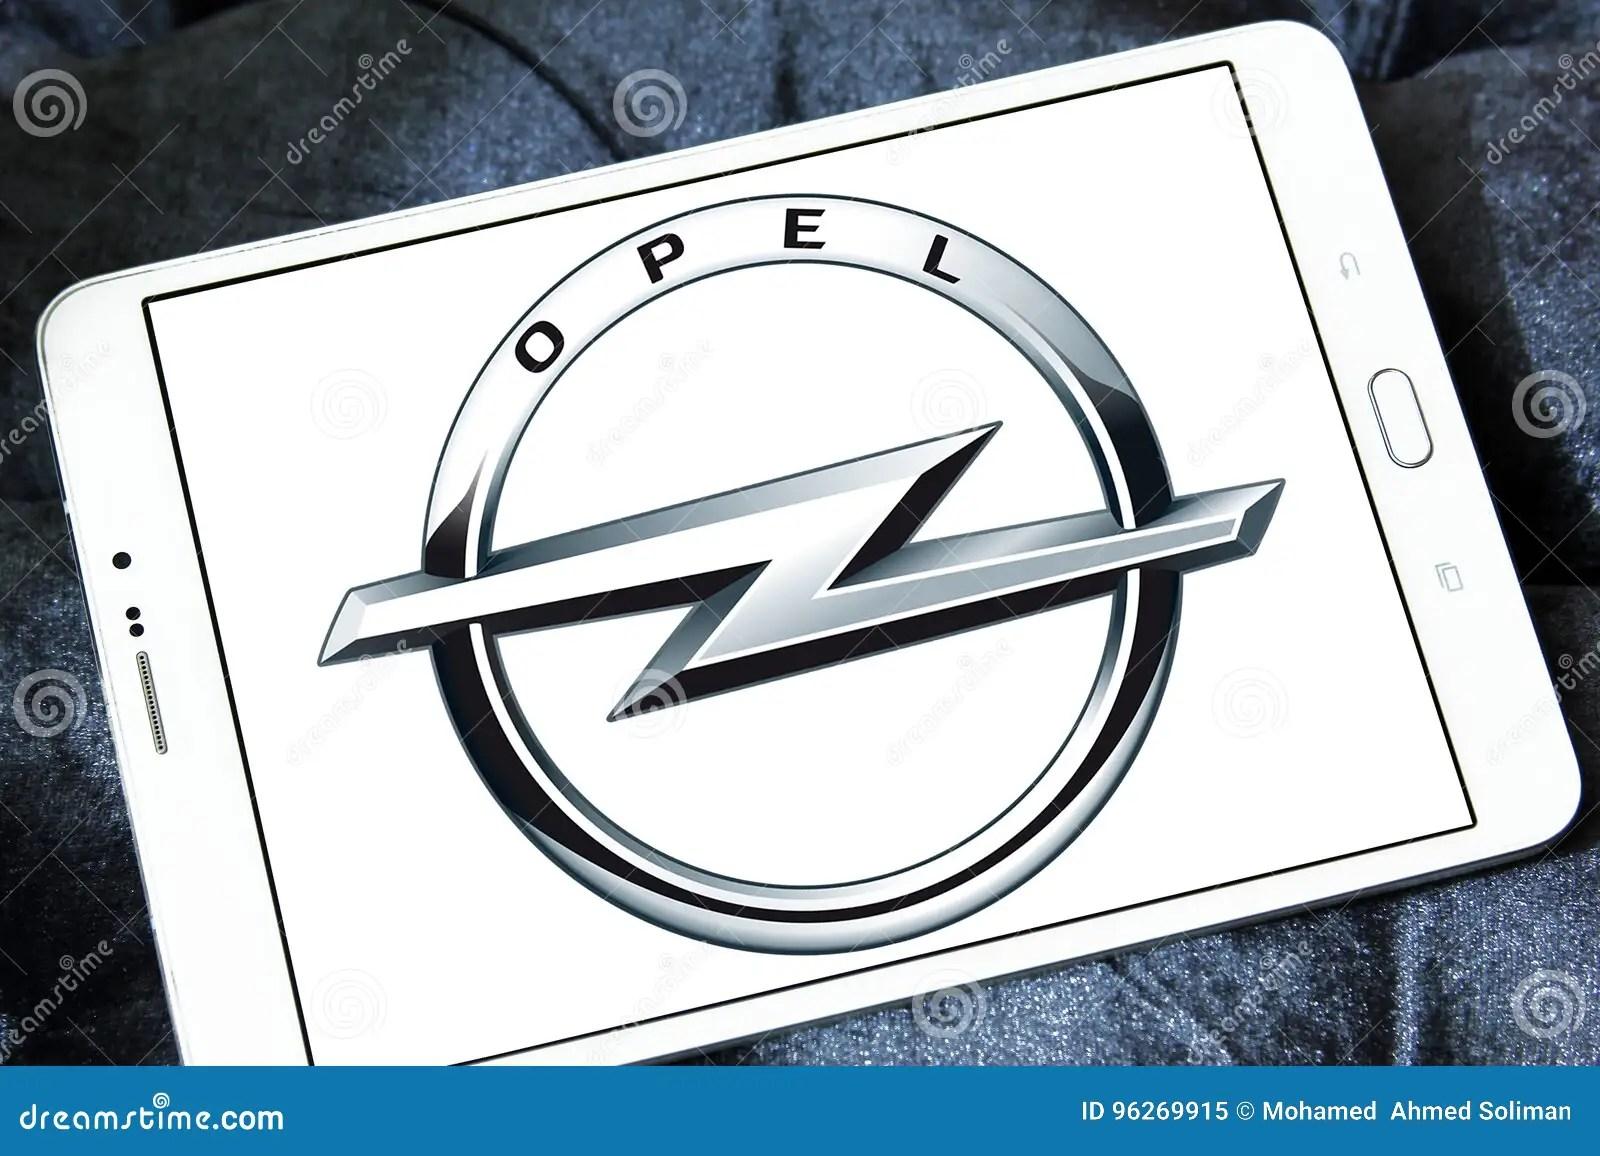 hight resolution of logo of opel car brand on samsung tablet